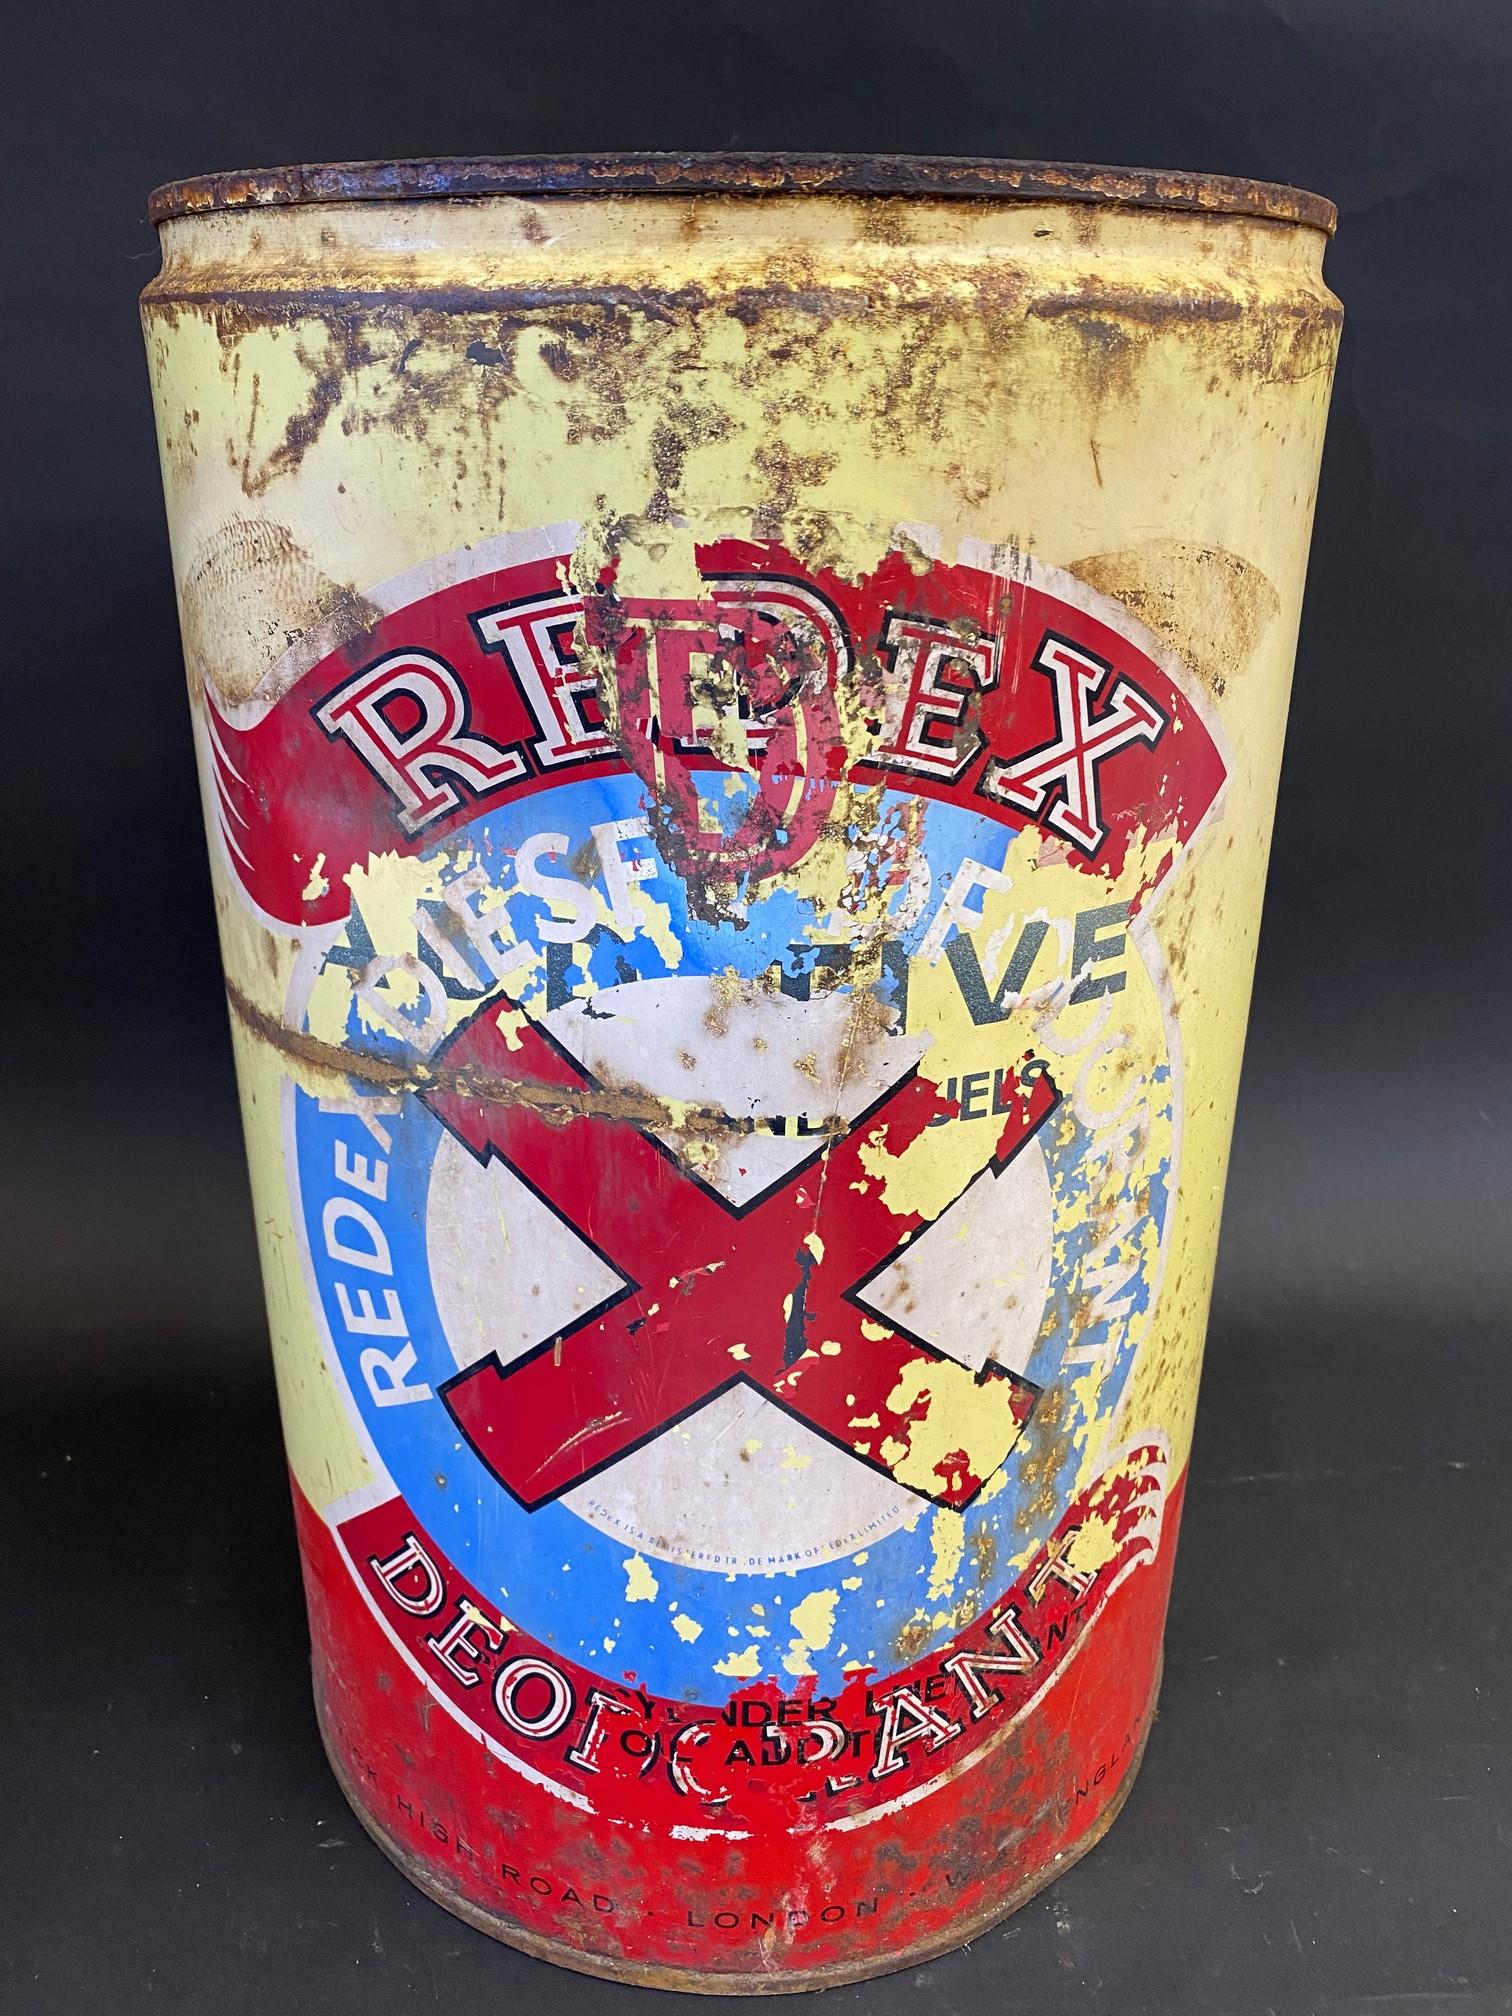 An unusual Redex five gallon drum for 'Redex Diesel Deodorant'. - Image 2 of 4